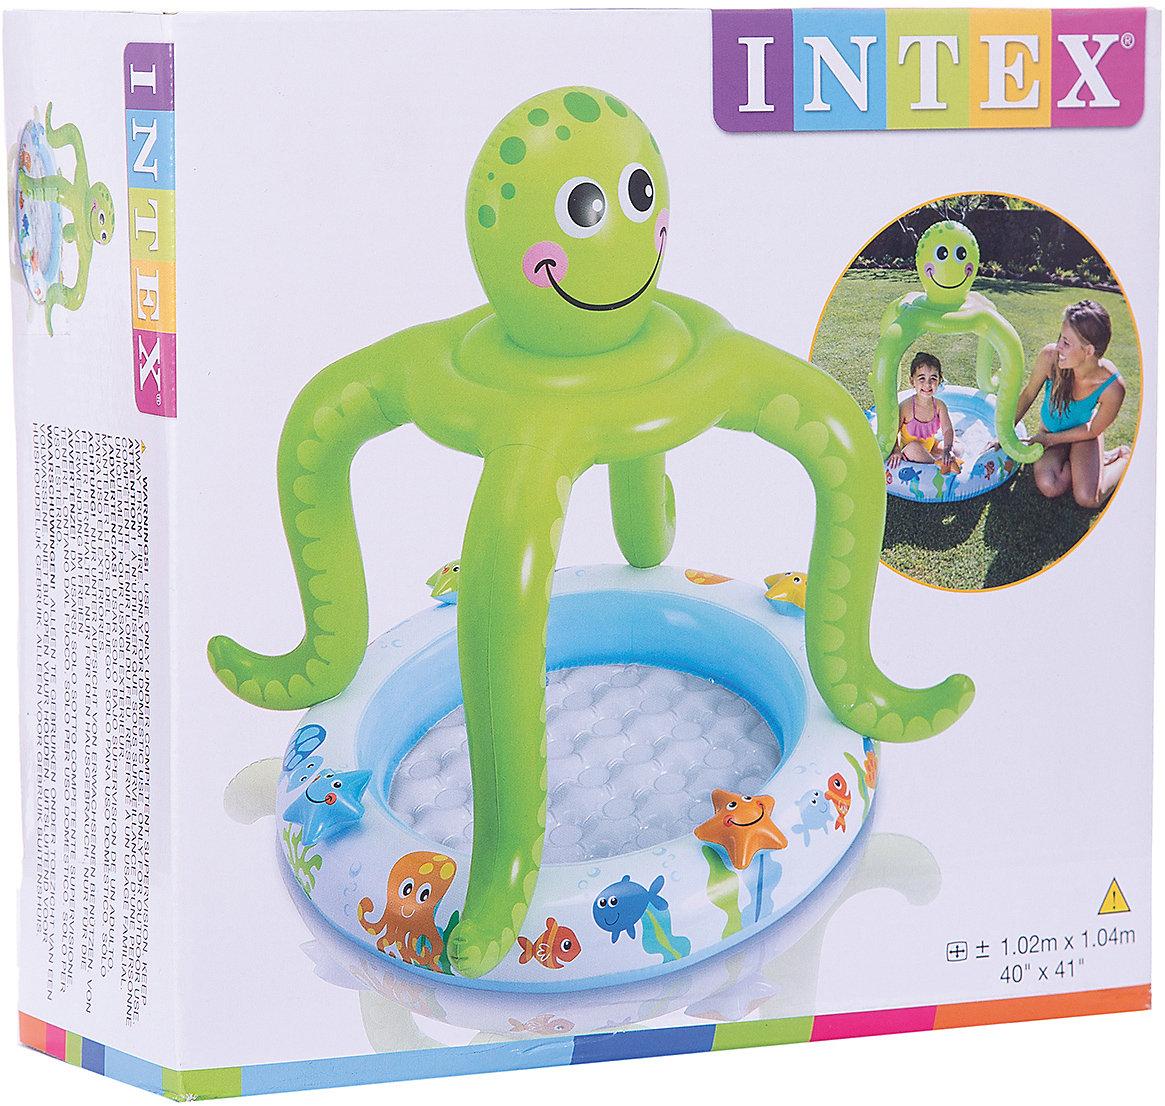 Neu Intex Planschbecken BabyPool Oktopus 6618420 grün